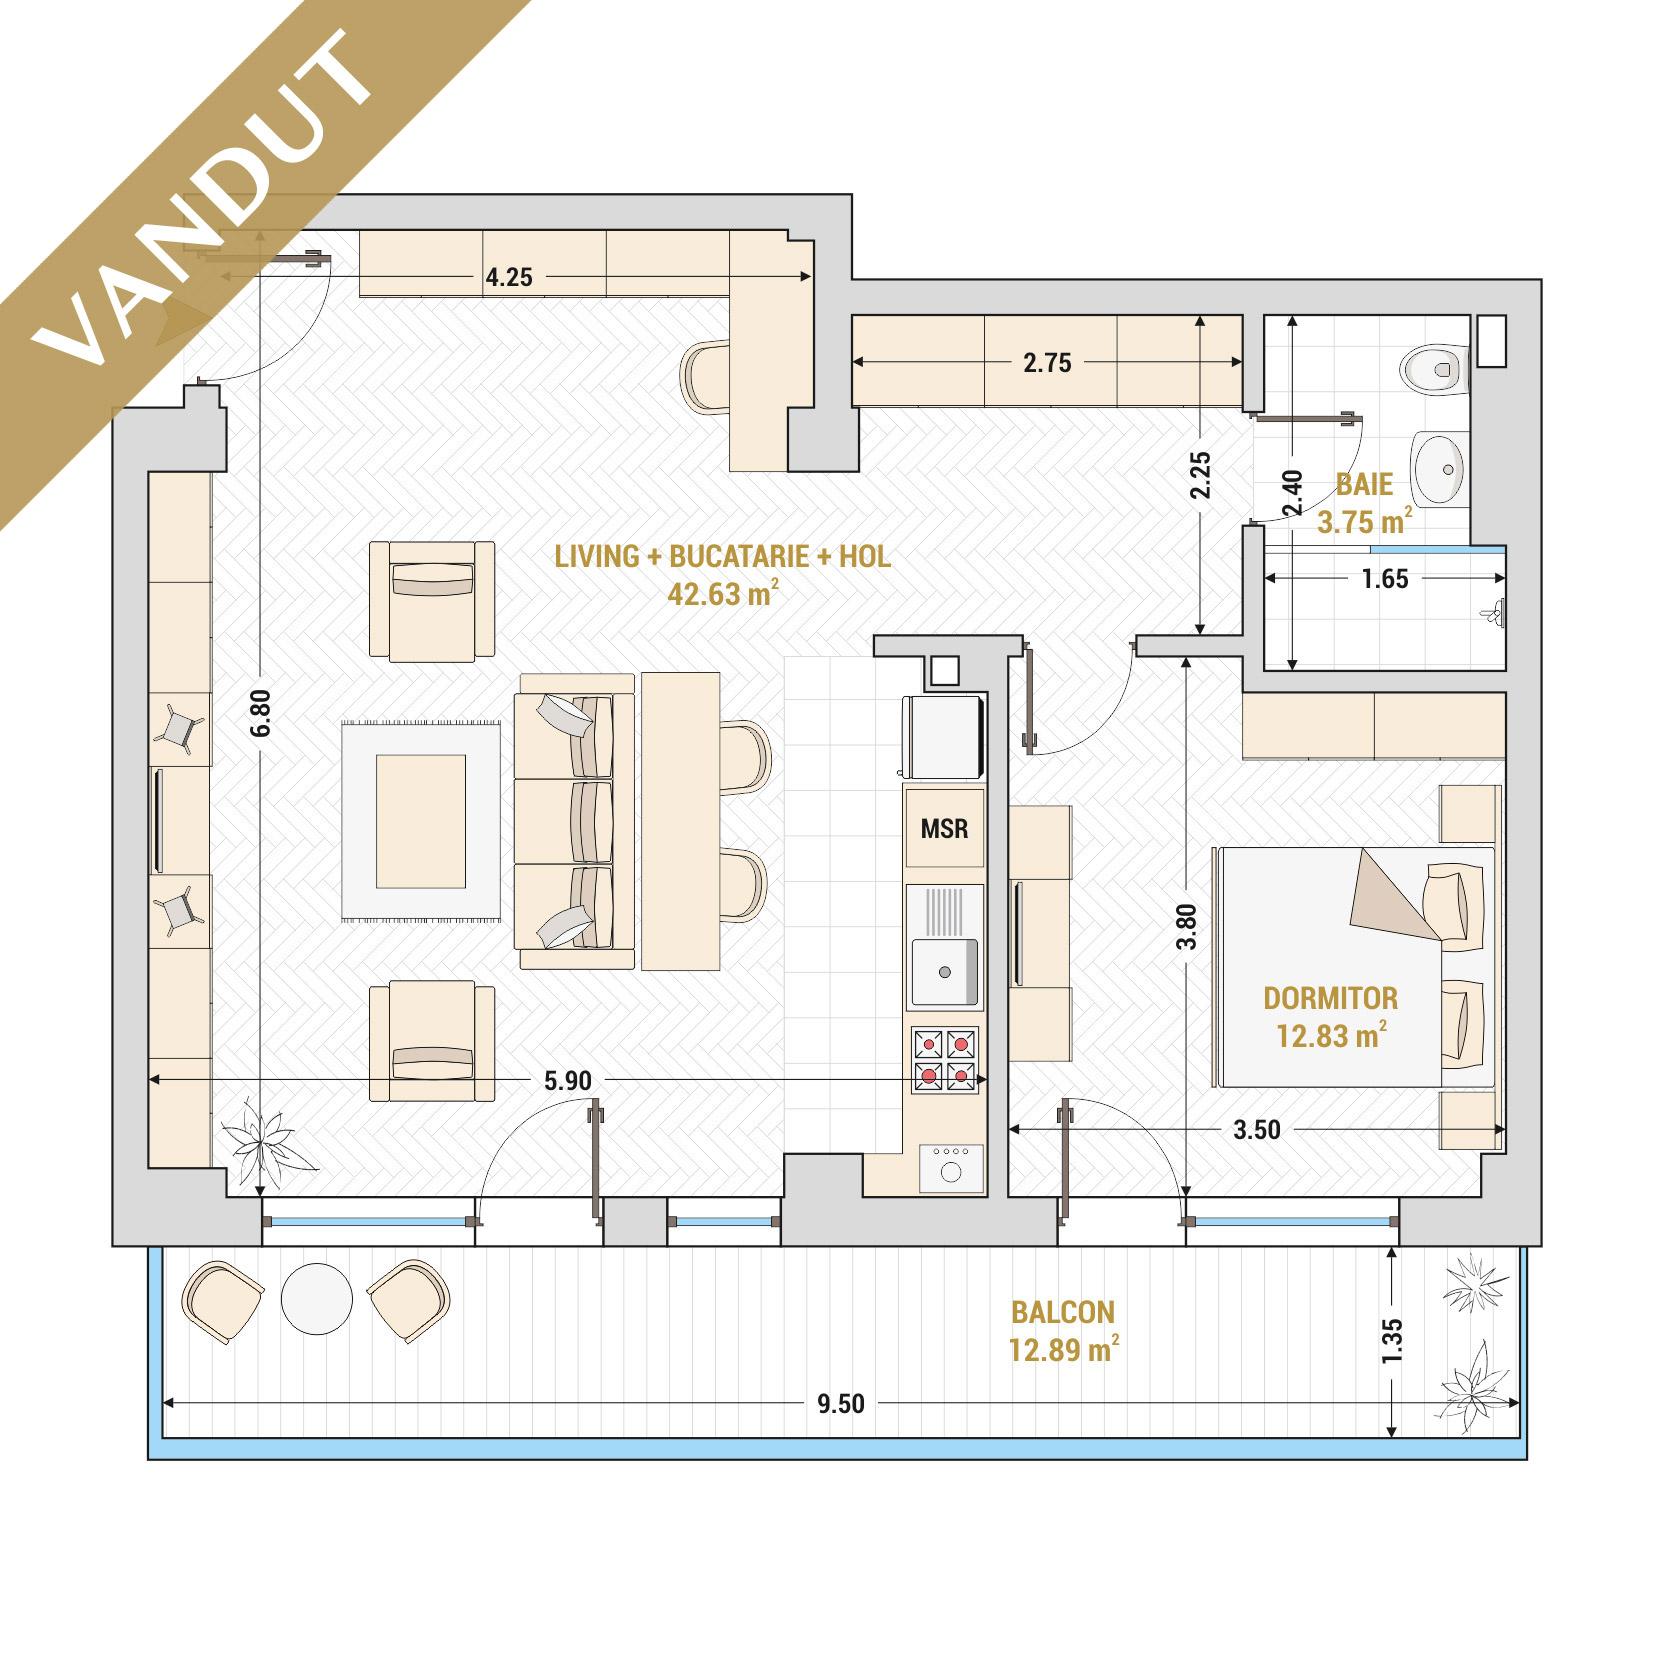 Apartamente-Gheorghieni-Marriott-Unirii-13-Septembrie-Izvor-Catedrala-Mantuirii-Neamului-Tip-7-T1 - V